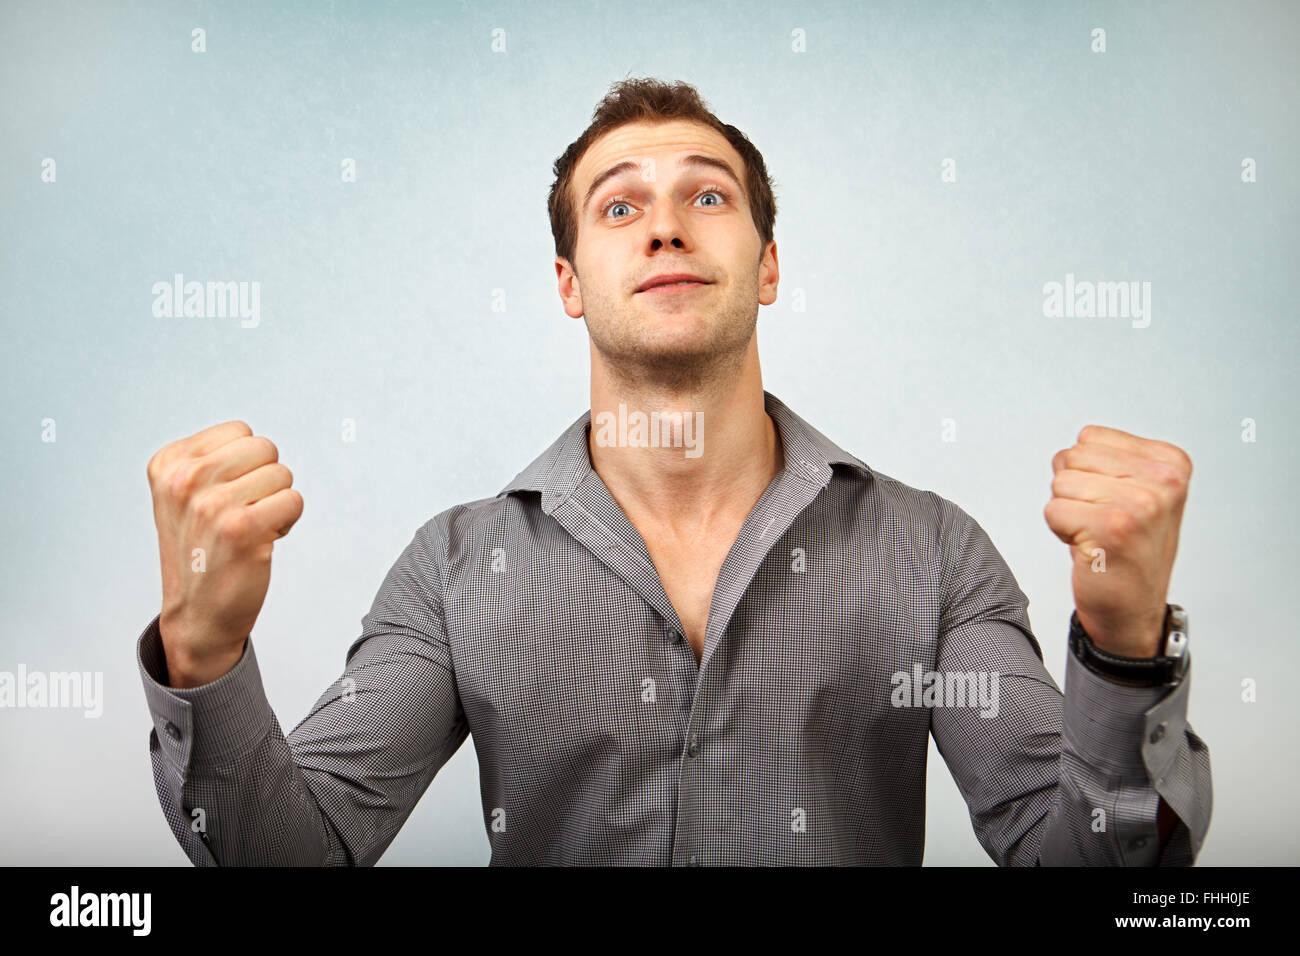 Happy winning man isolated on white - Stock Image